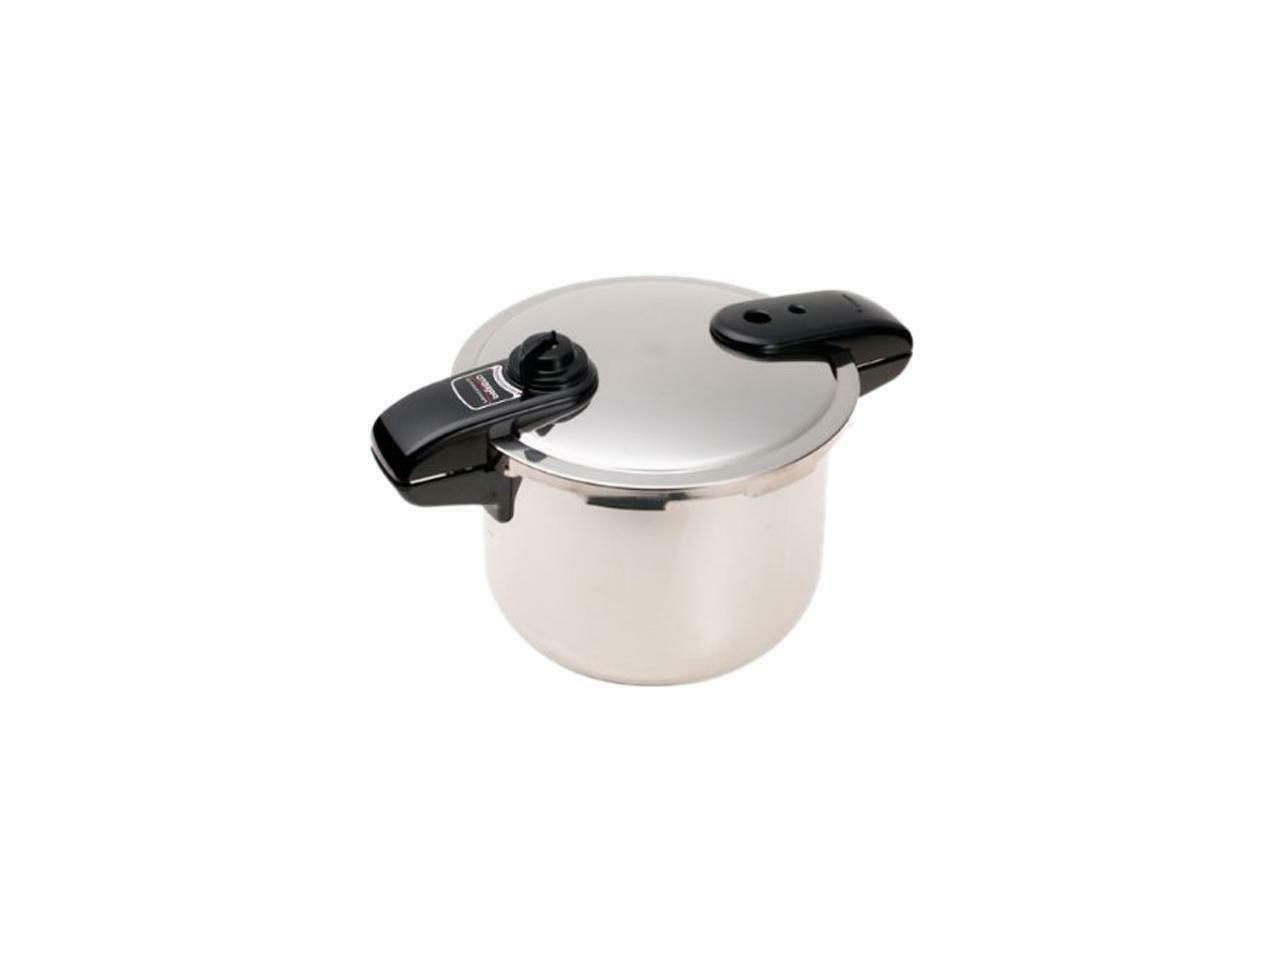 01370 8 quart stainless steel pressure cooker